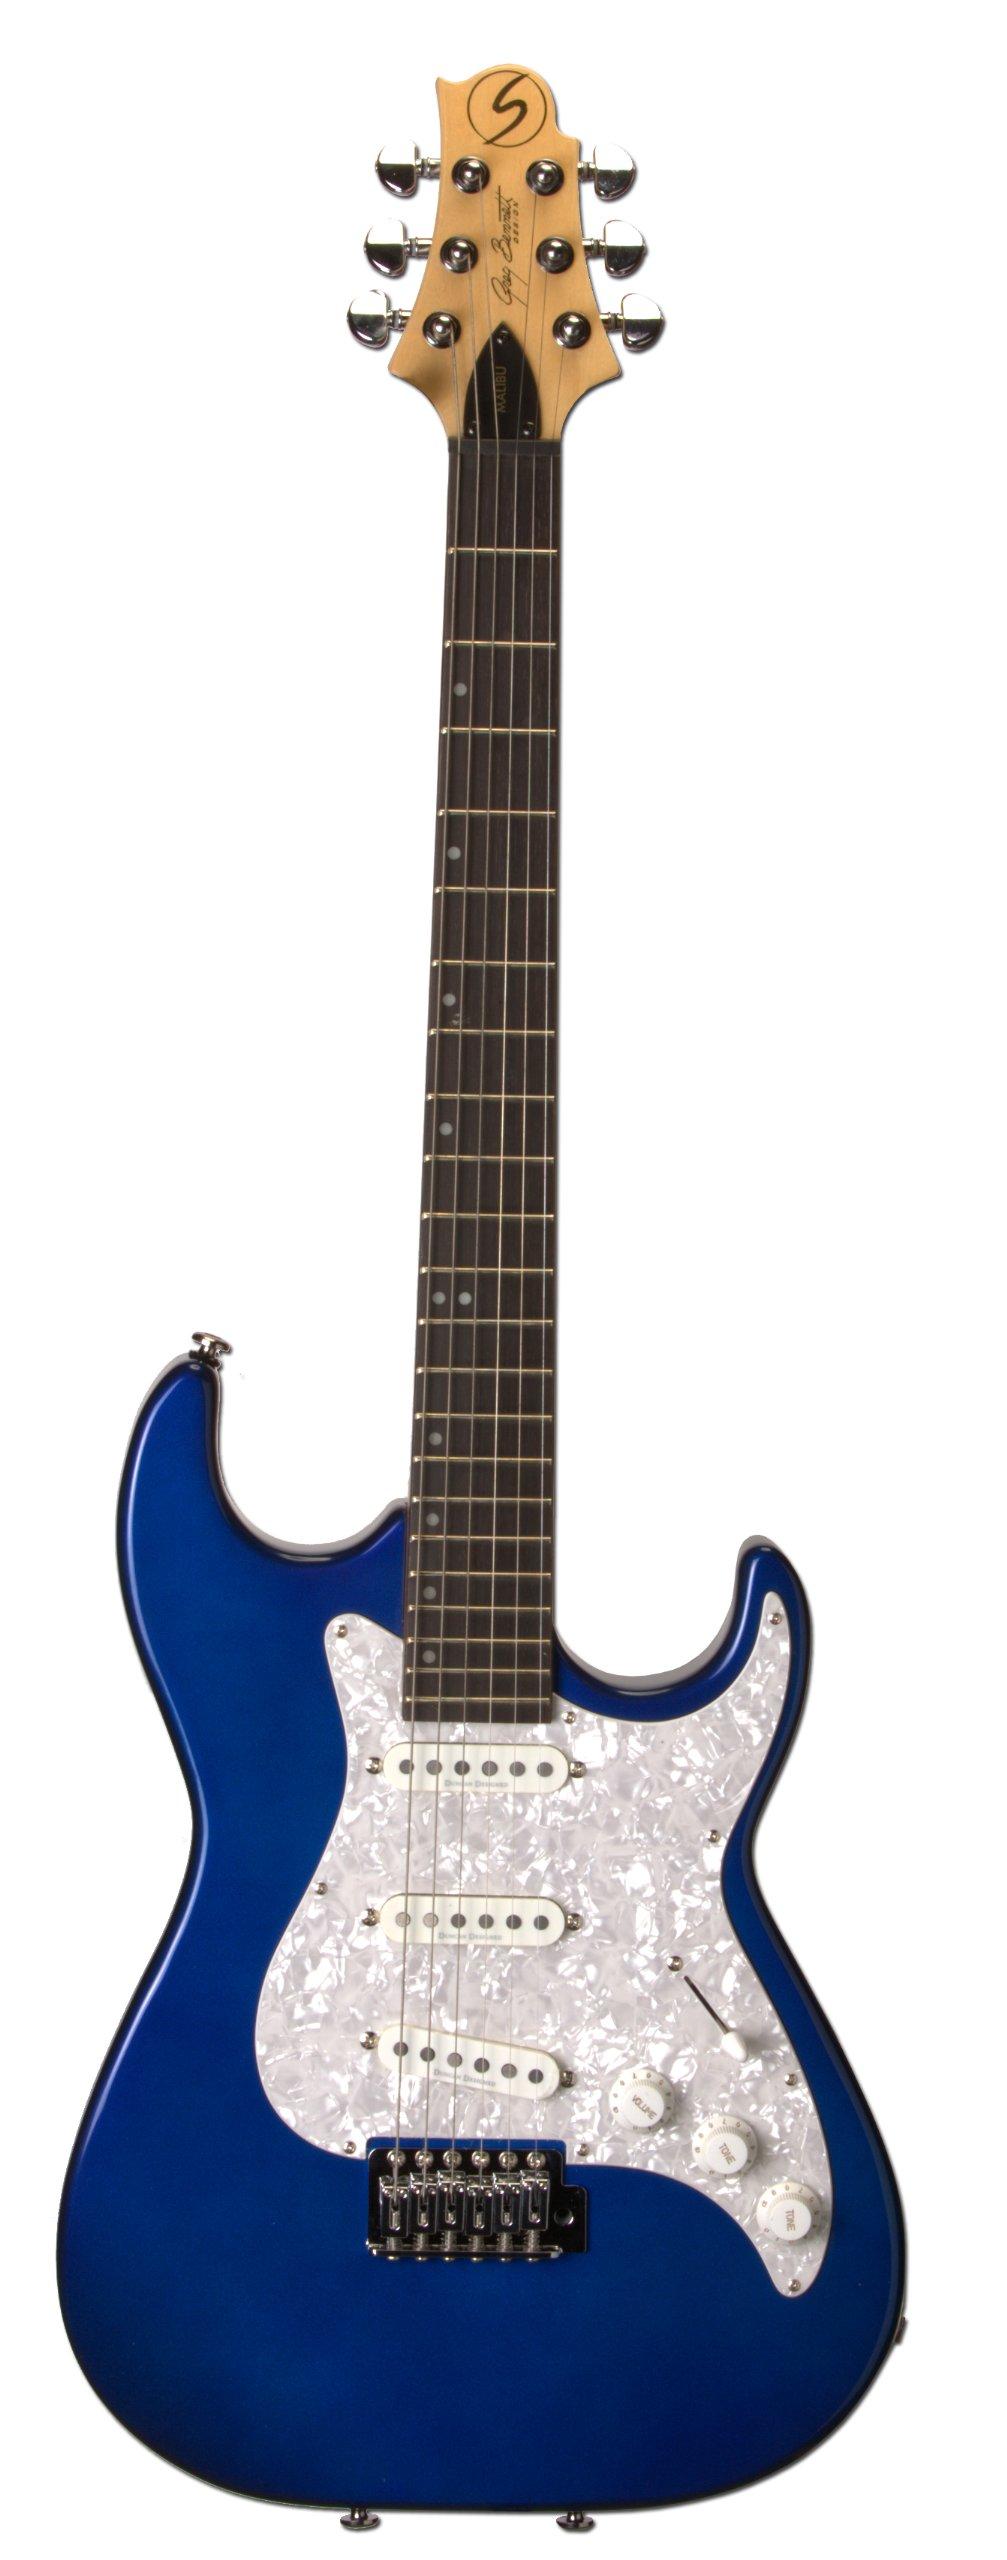 Cheap Samick Greg Bennett Design MB30 Electric Guitar Midnight Blue Metallic Black Friday & Cyber Monday 2019